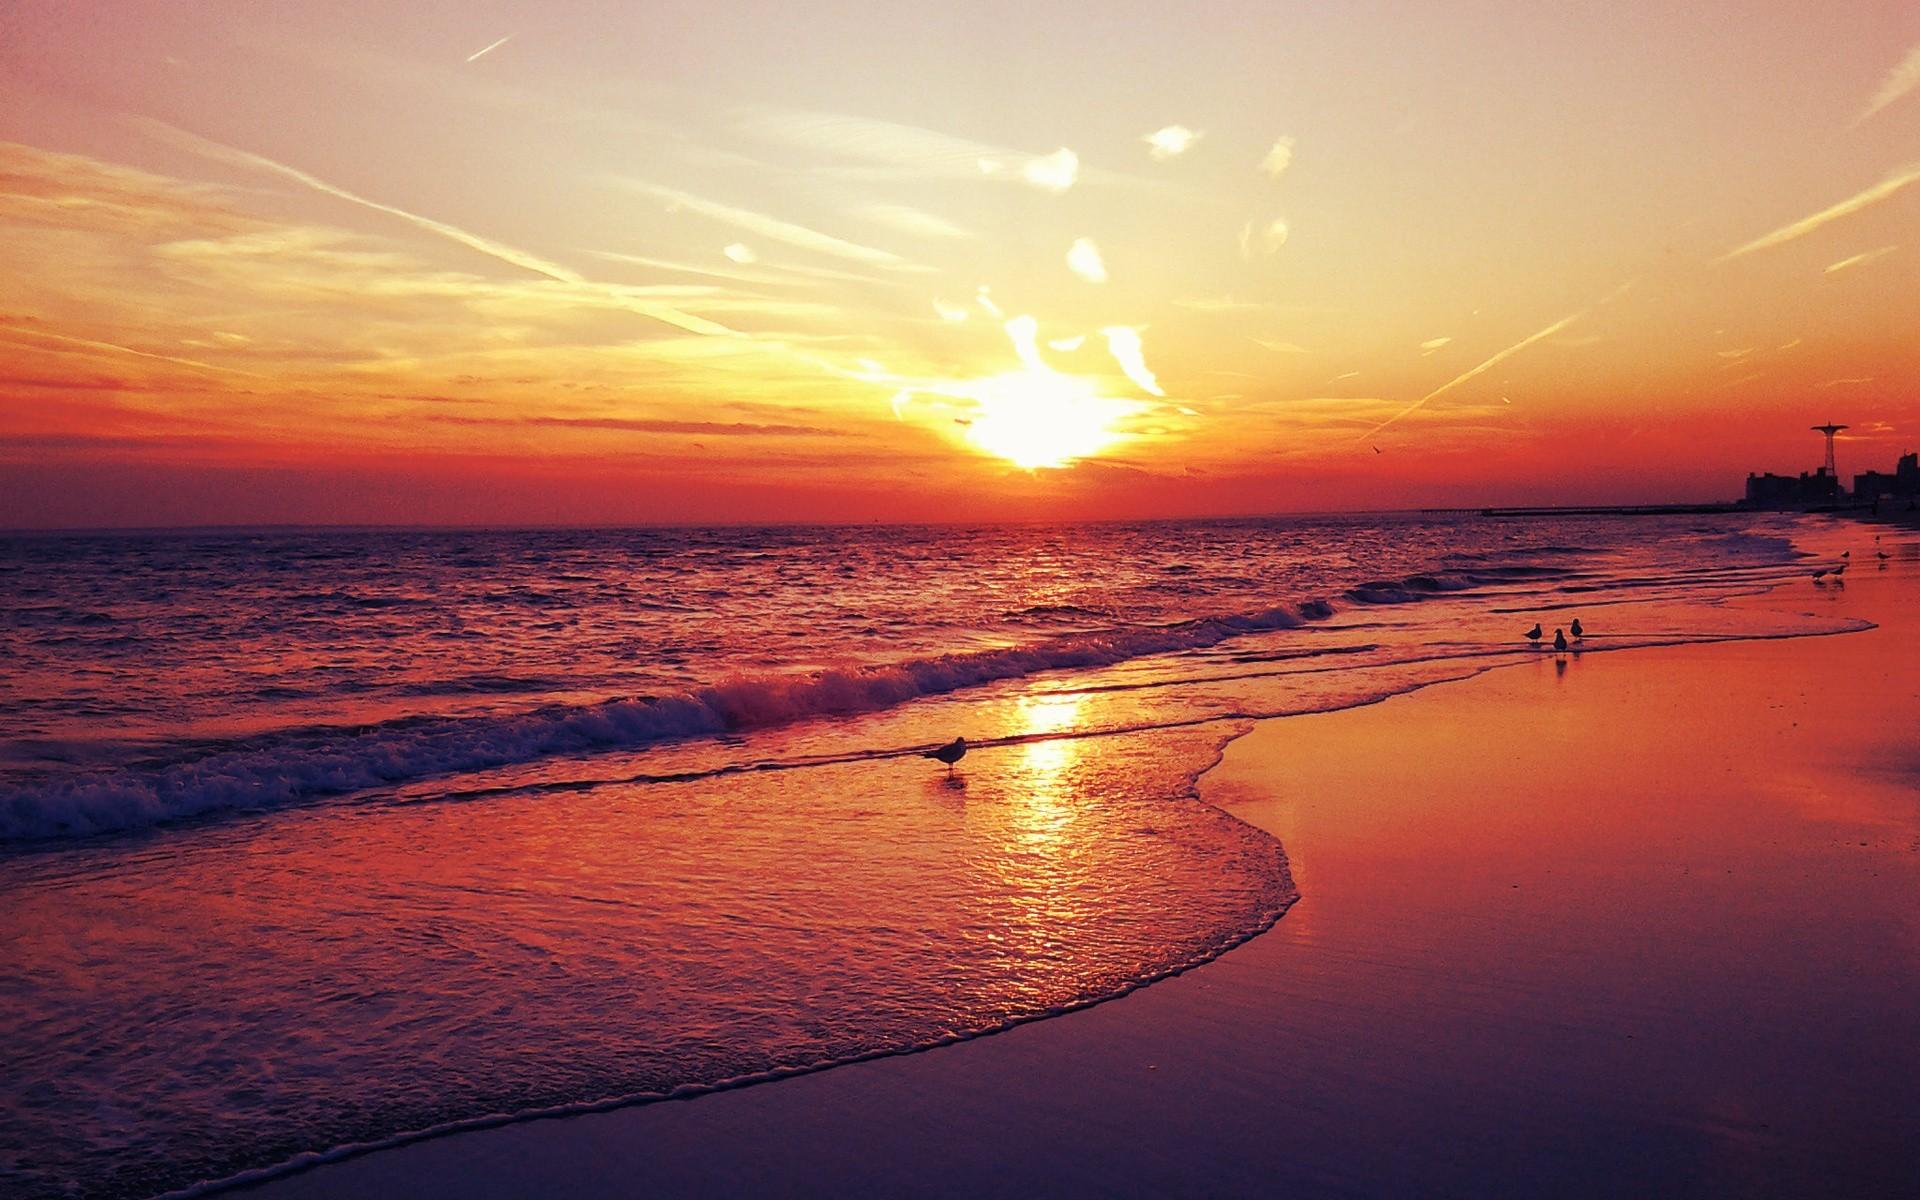 Landscapes   sunset landscapes beach seascapes fresh new hd wallpaper